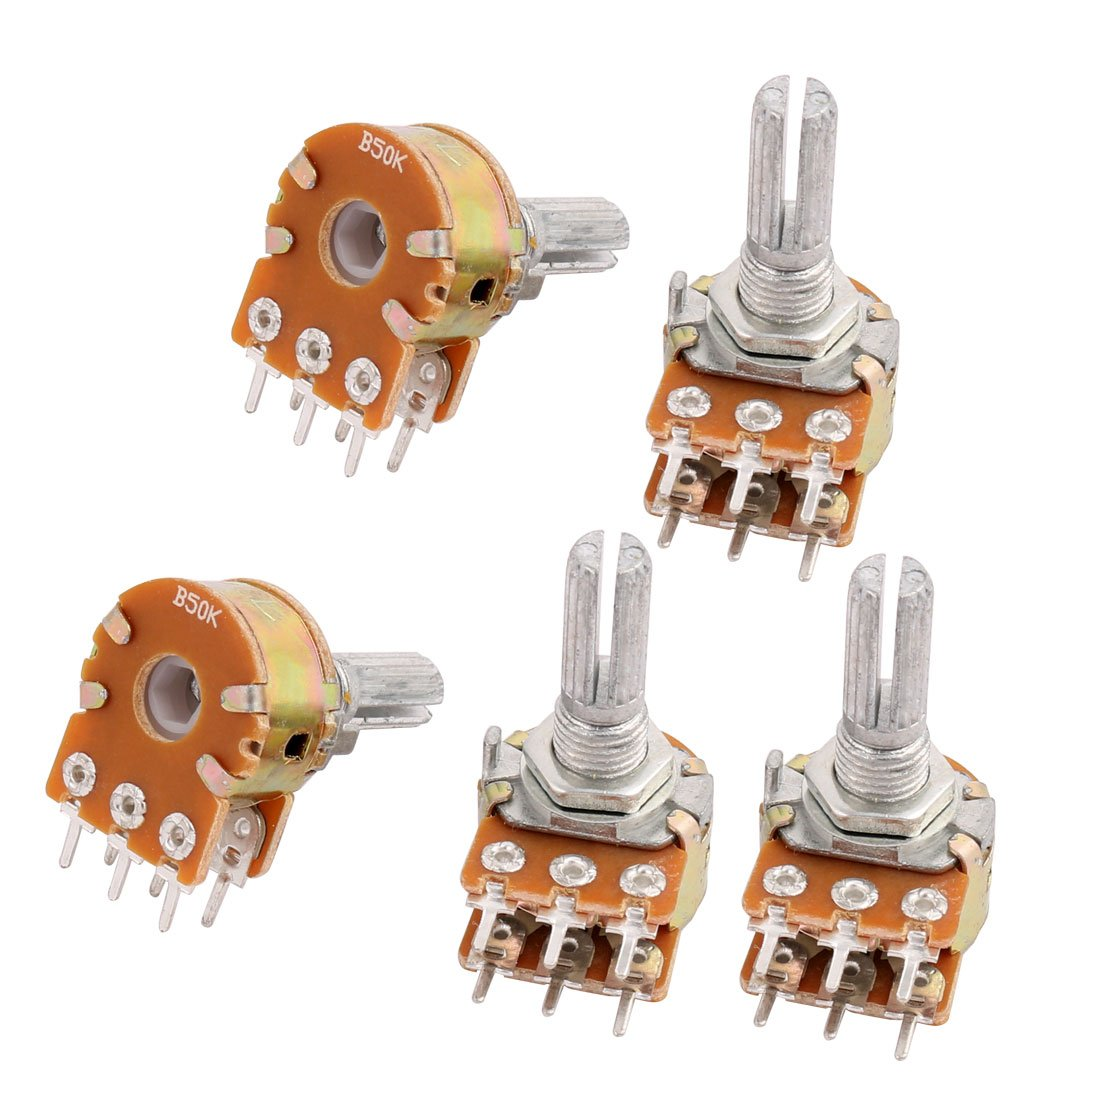 sourcing map 5 Pcs B50K 50K ohm 6 Pins Split Shaft Rotary Linear Dual Taper Potentiometers 032043